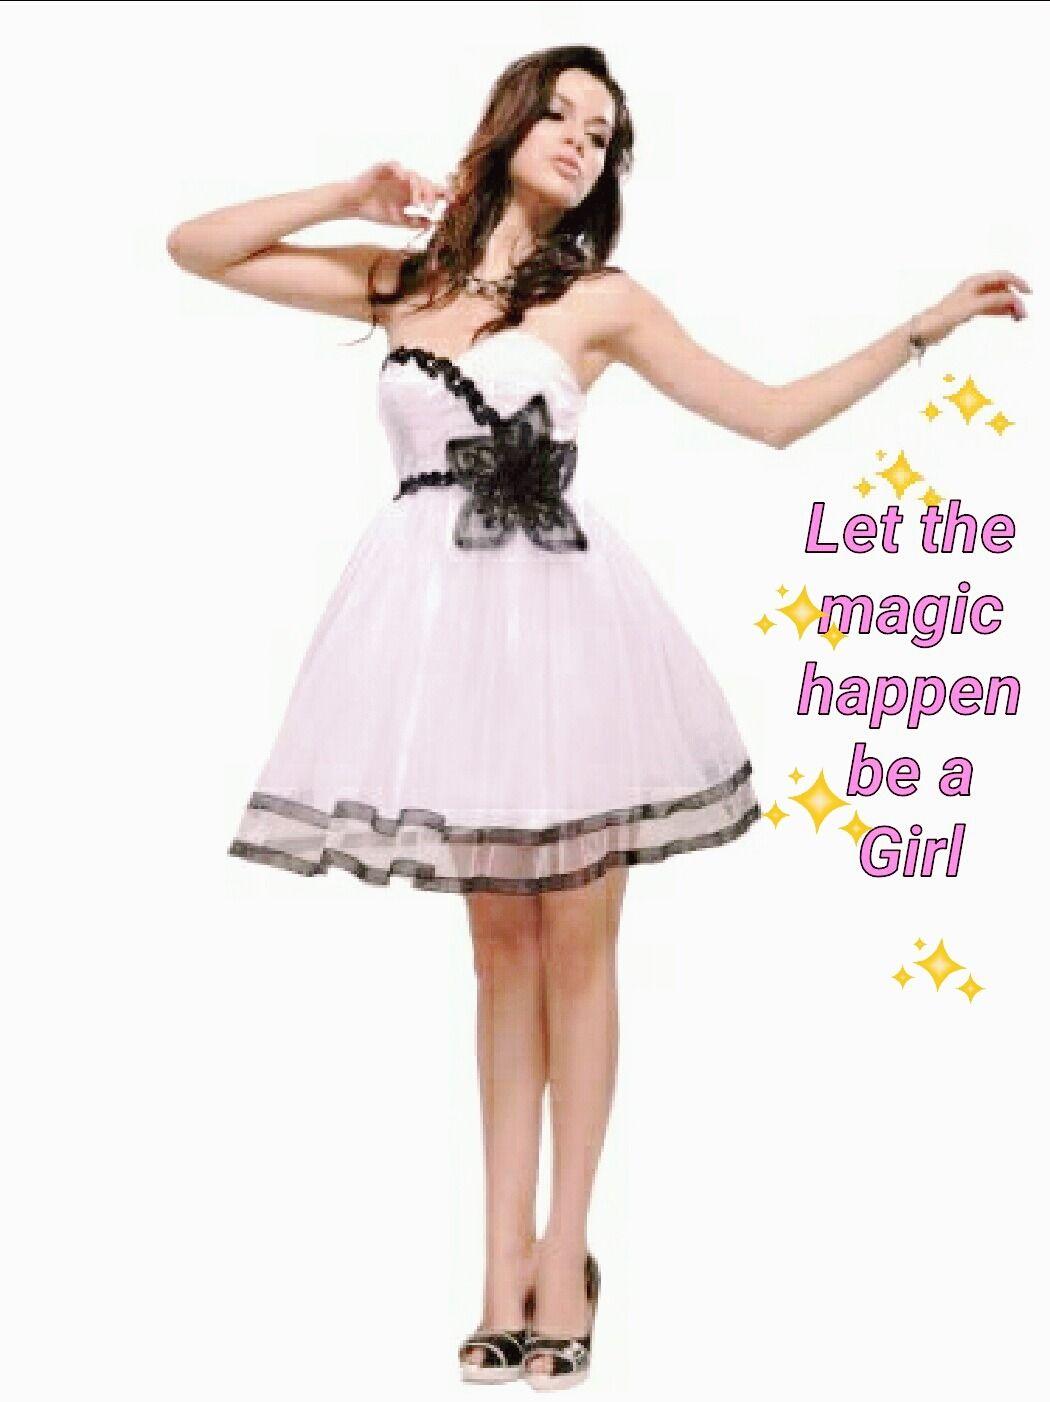 Louiselonging sissy caps pinterest dresses fashion and style